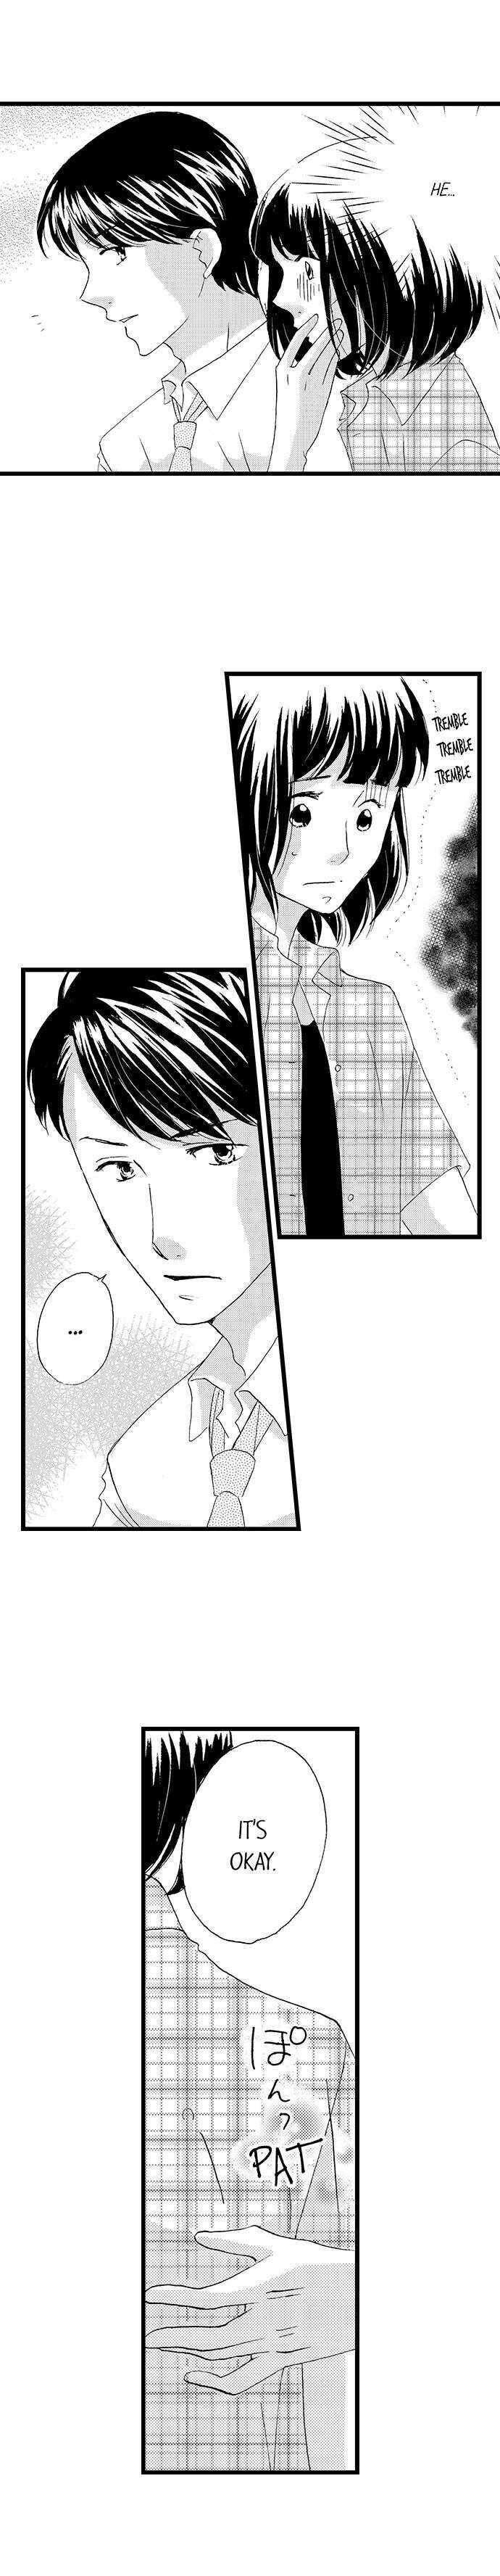 Amaku Nureru Uso Kekkon Toiu Na No Fukushu Chapter 64 page 5 - Mangakakalots.com